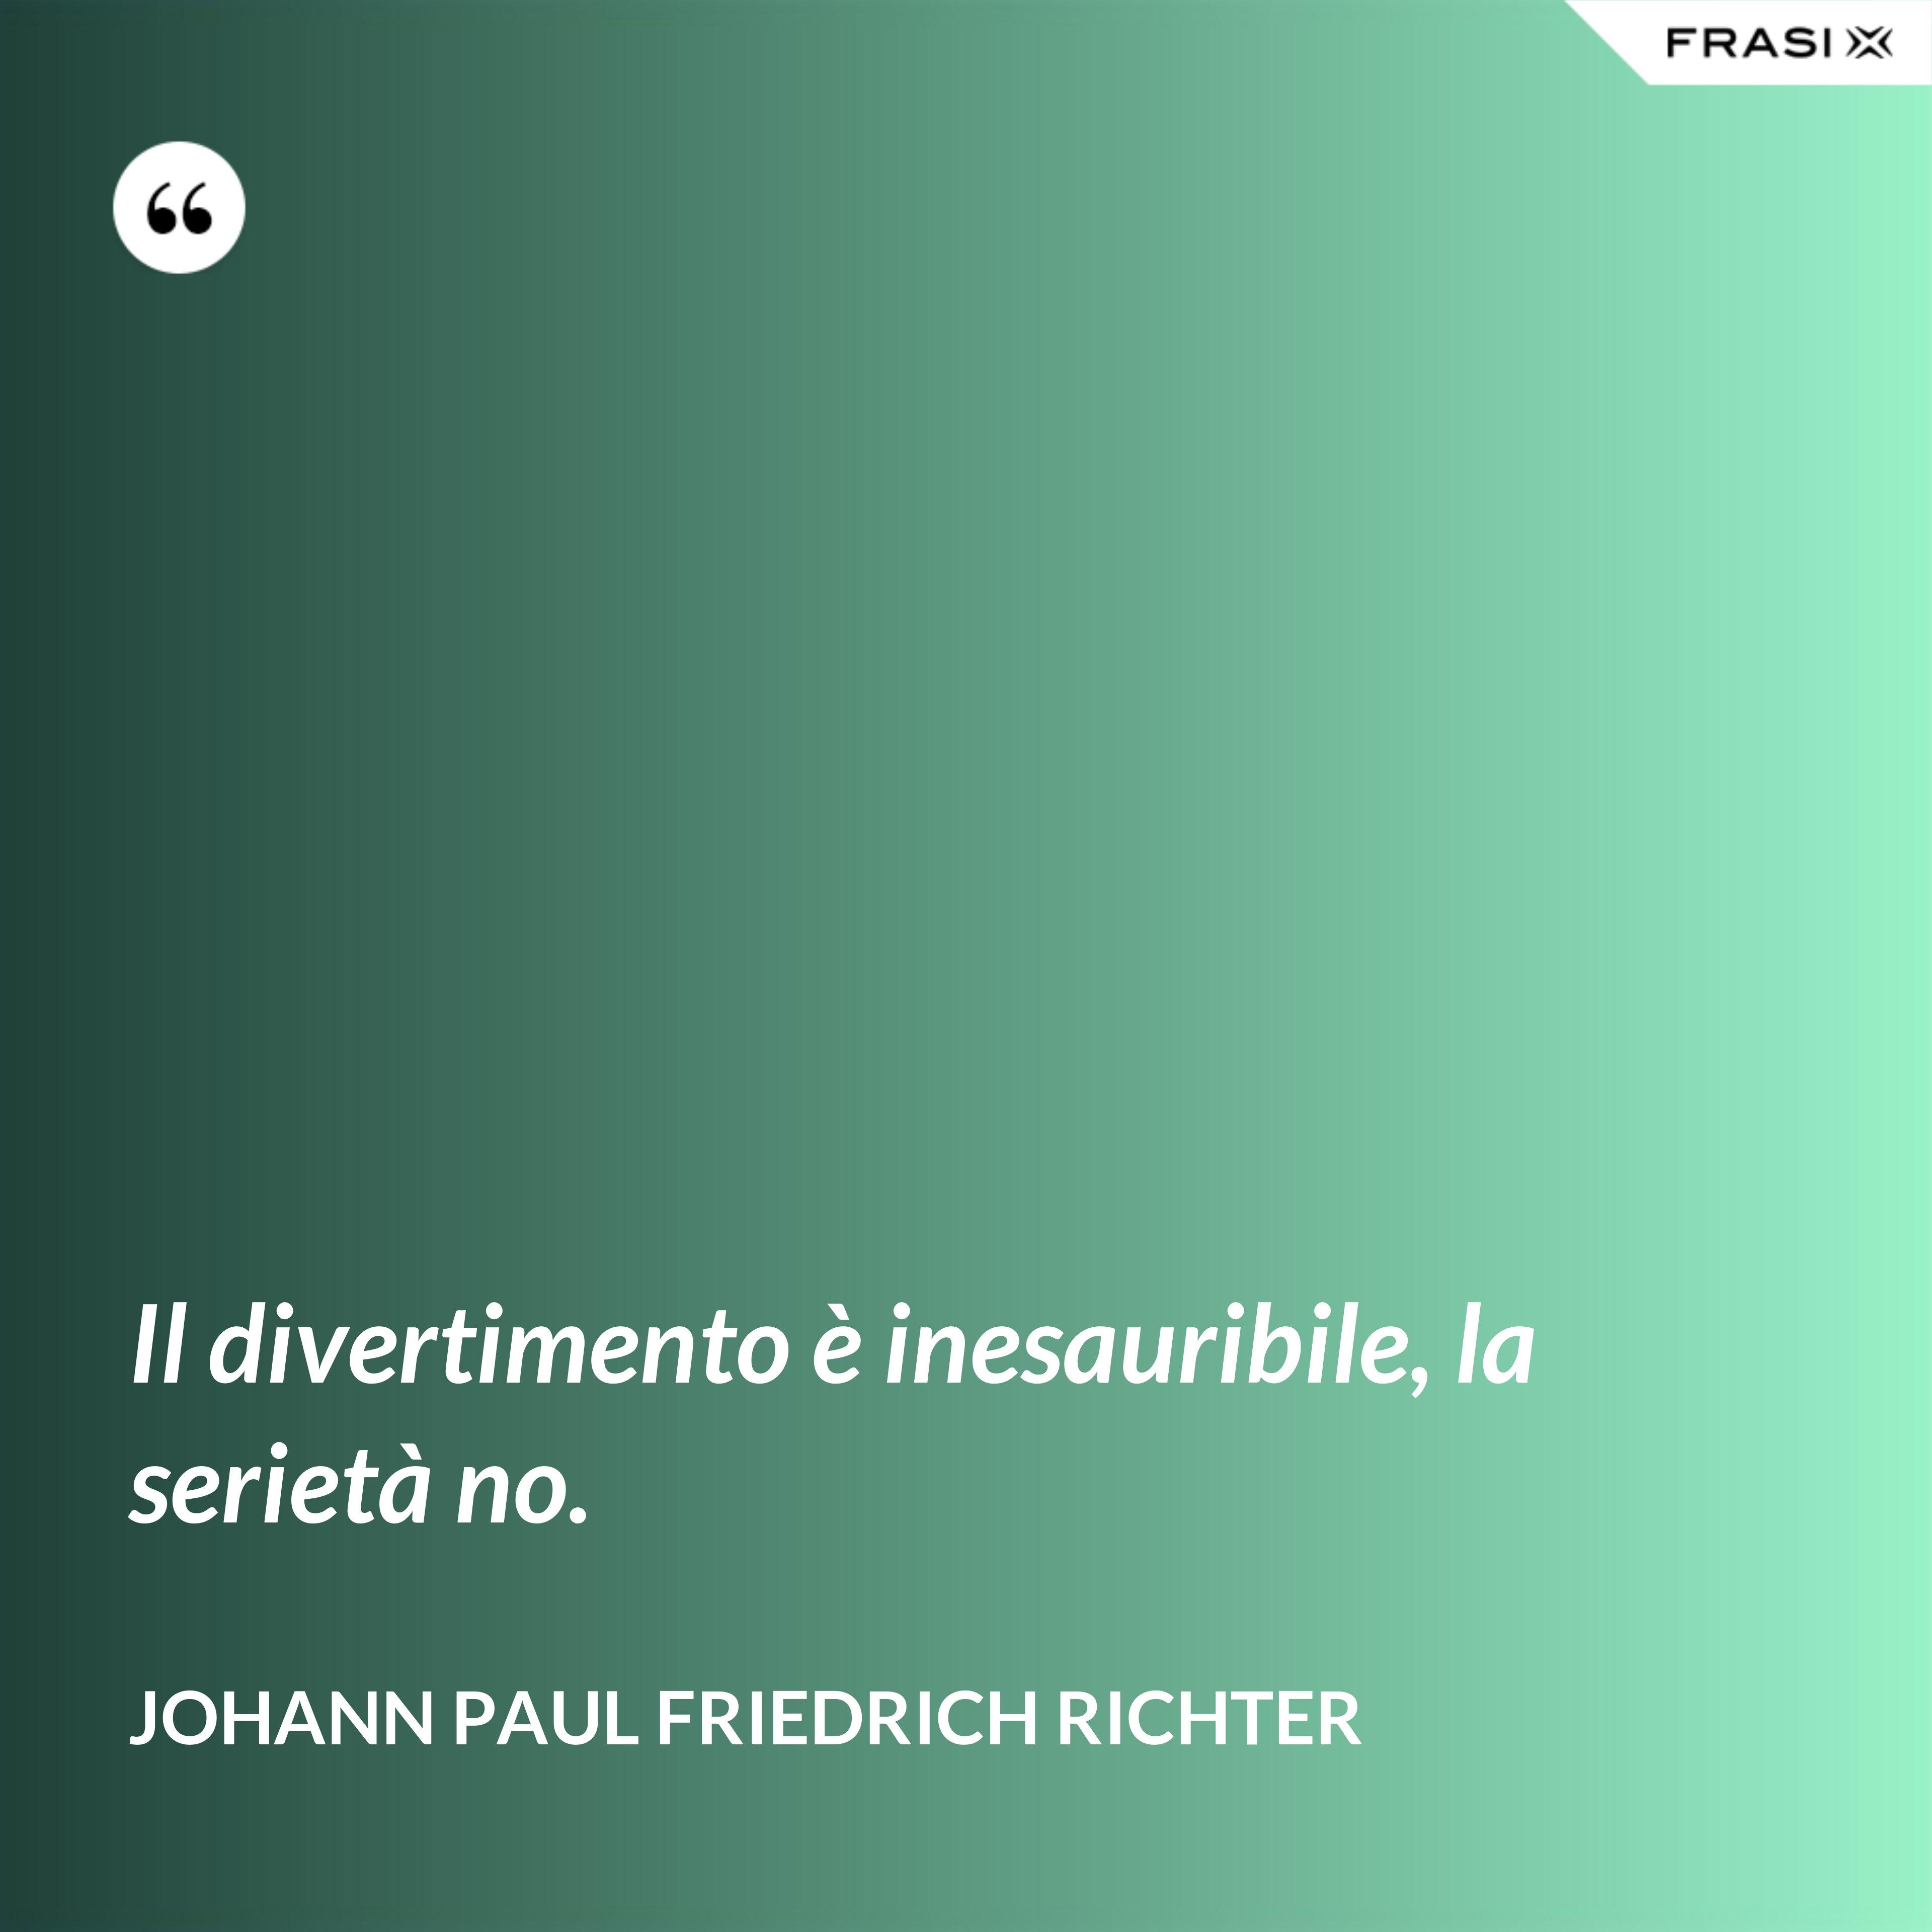 Il divertimento è inesauribile, la serietà no. - Johann Paul Friedrich Richter